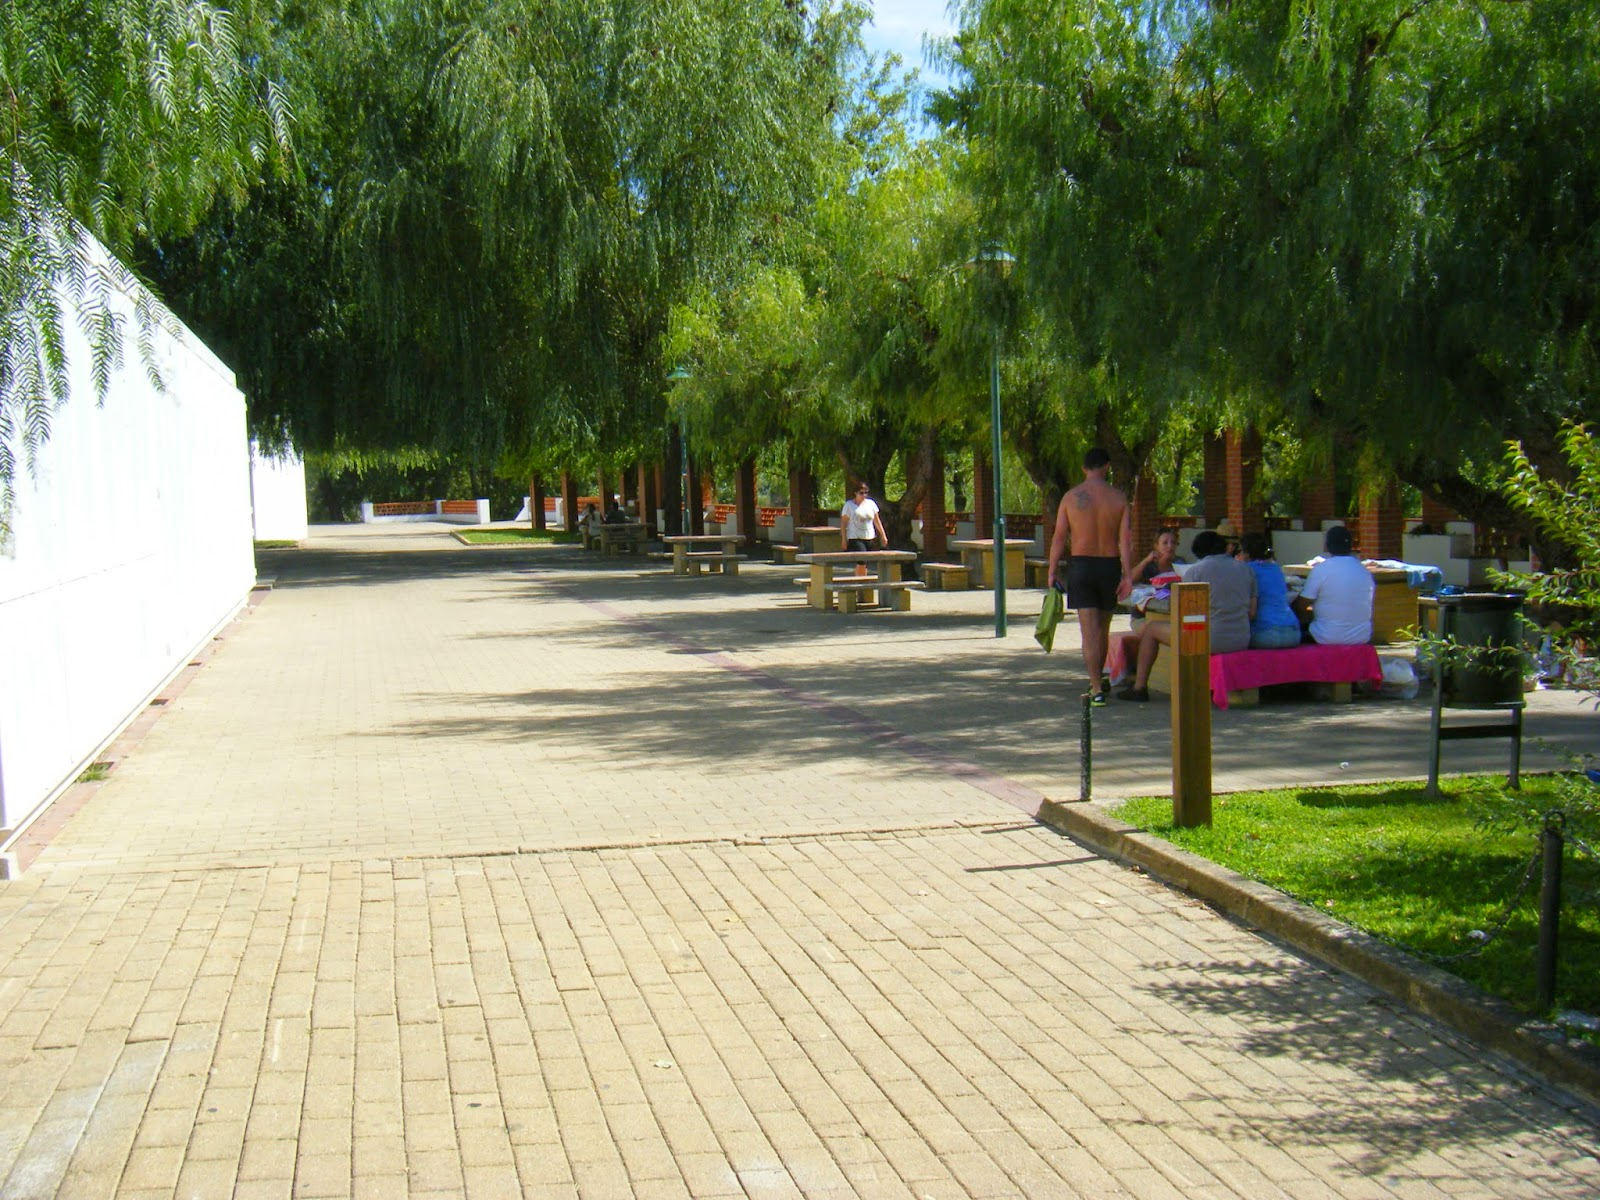 Parque de Merendas de Constância